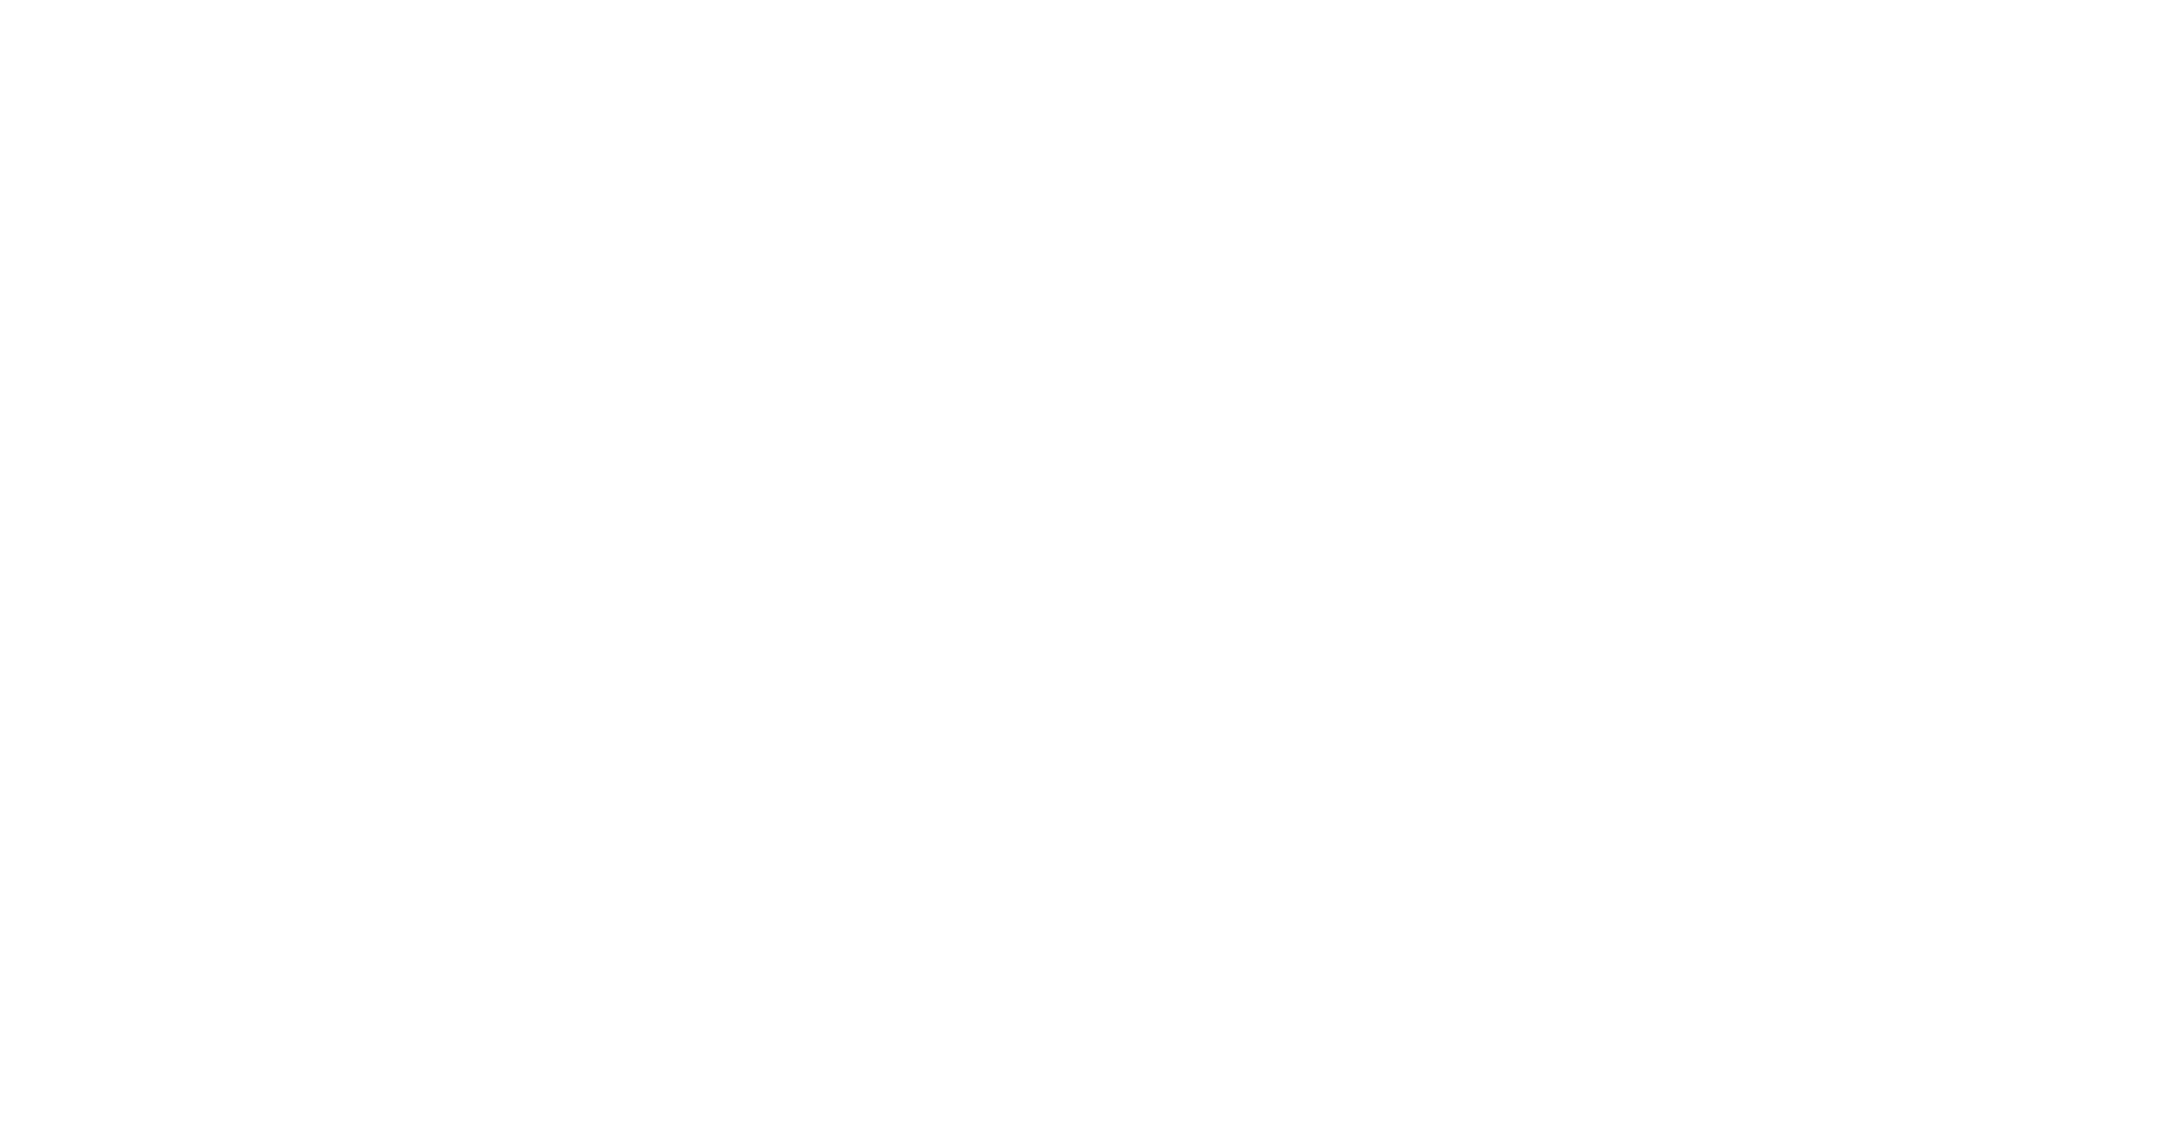 The SG Gaming logo.